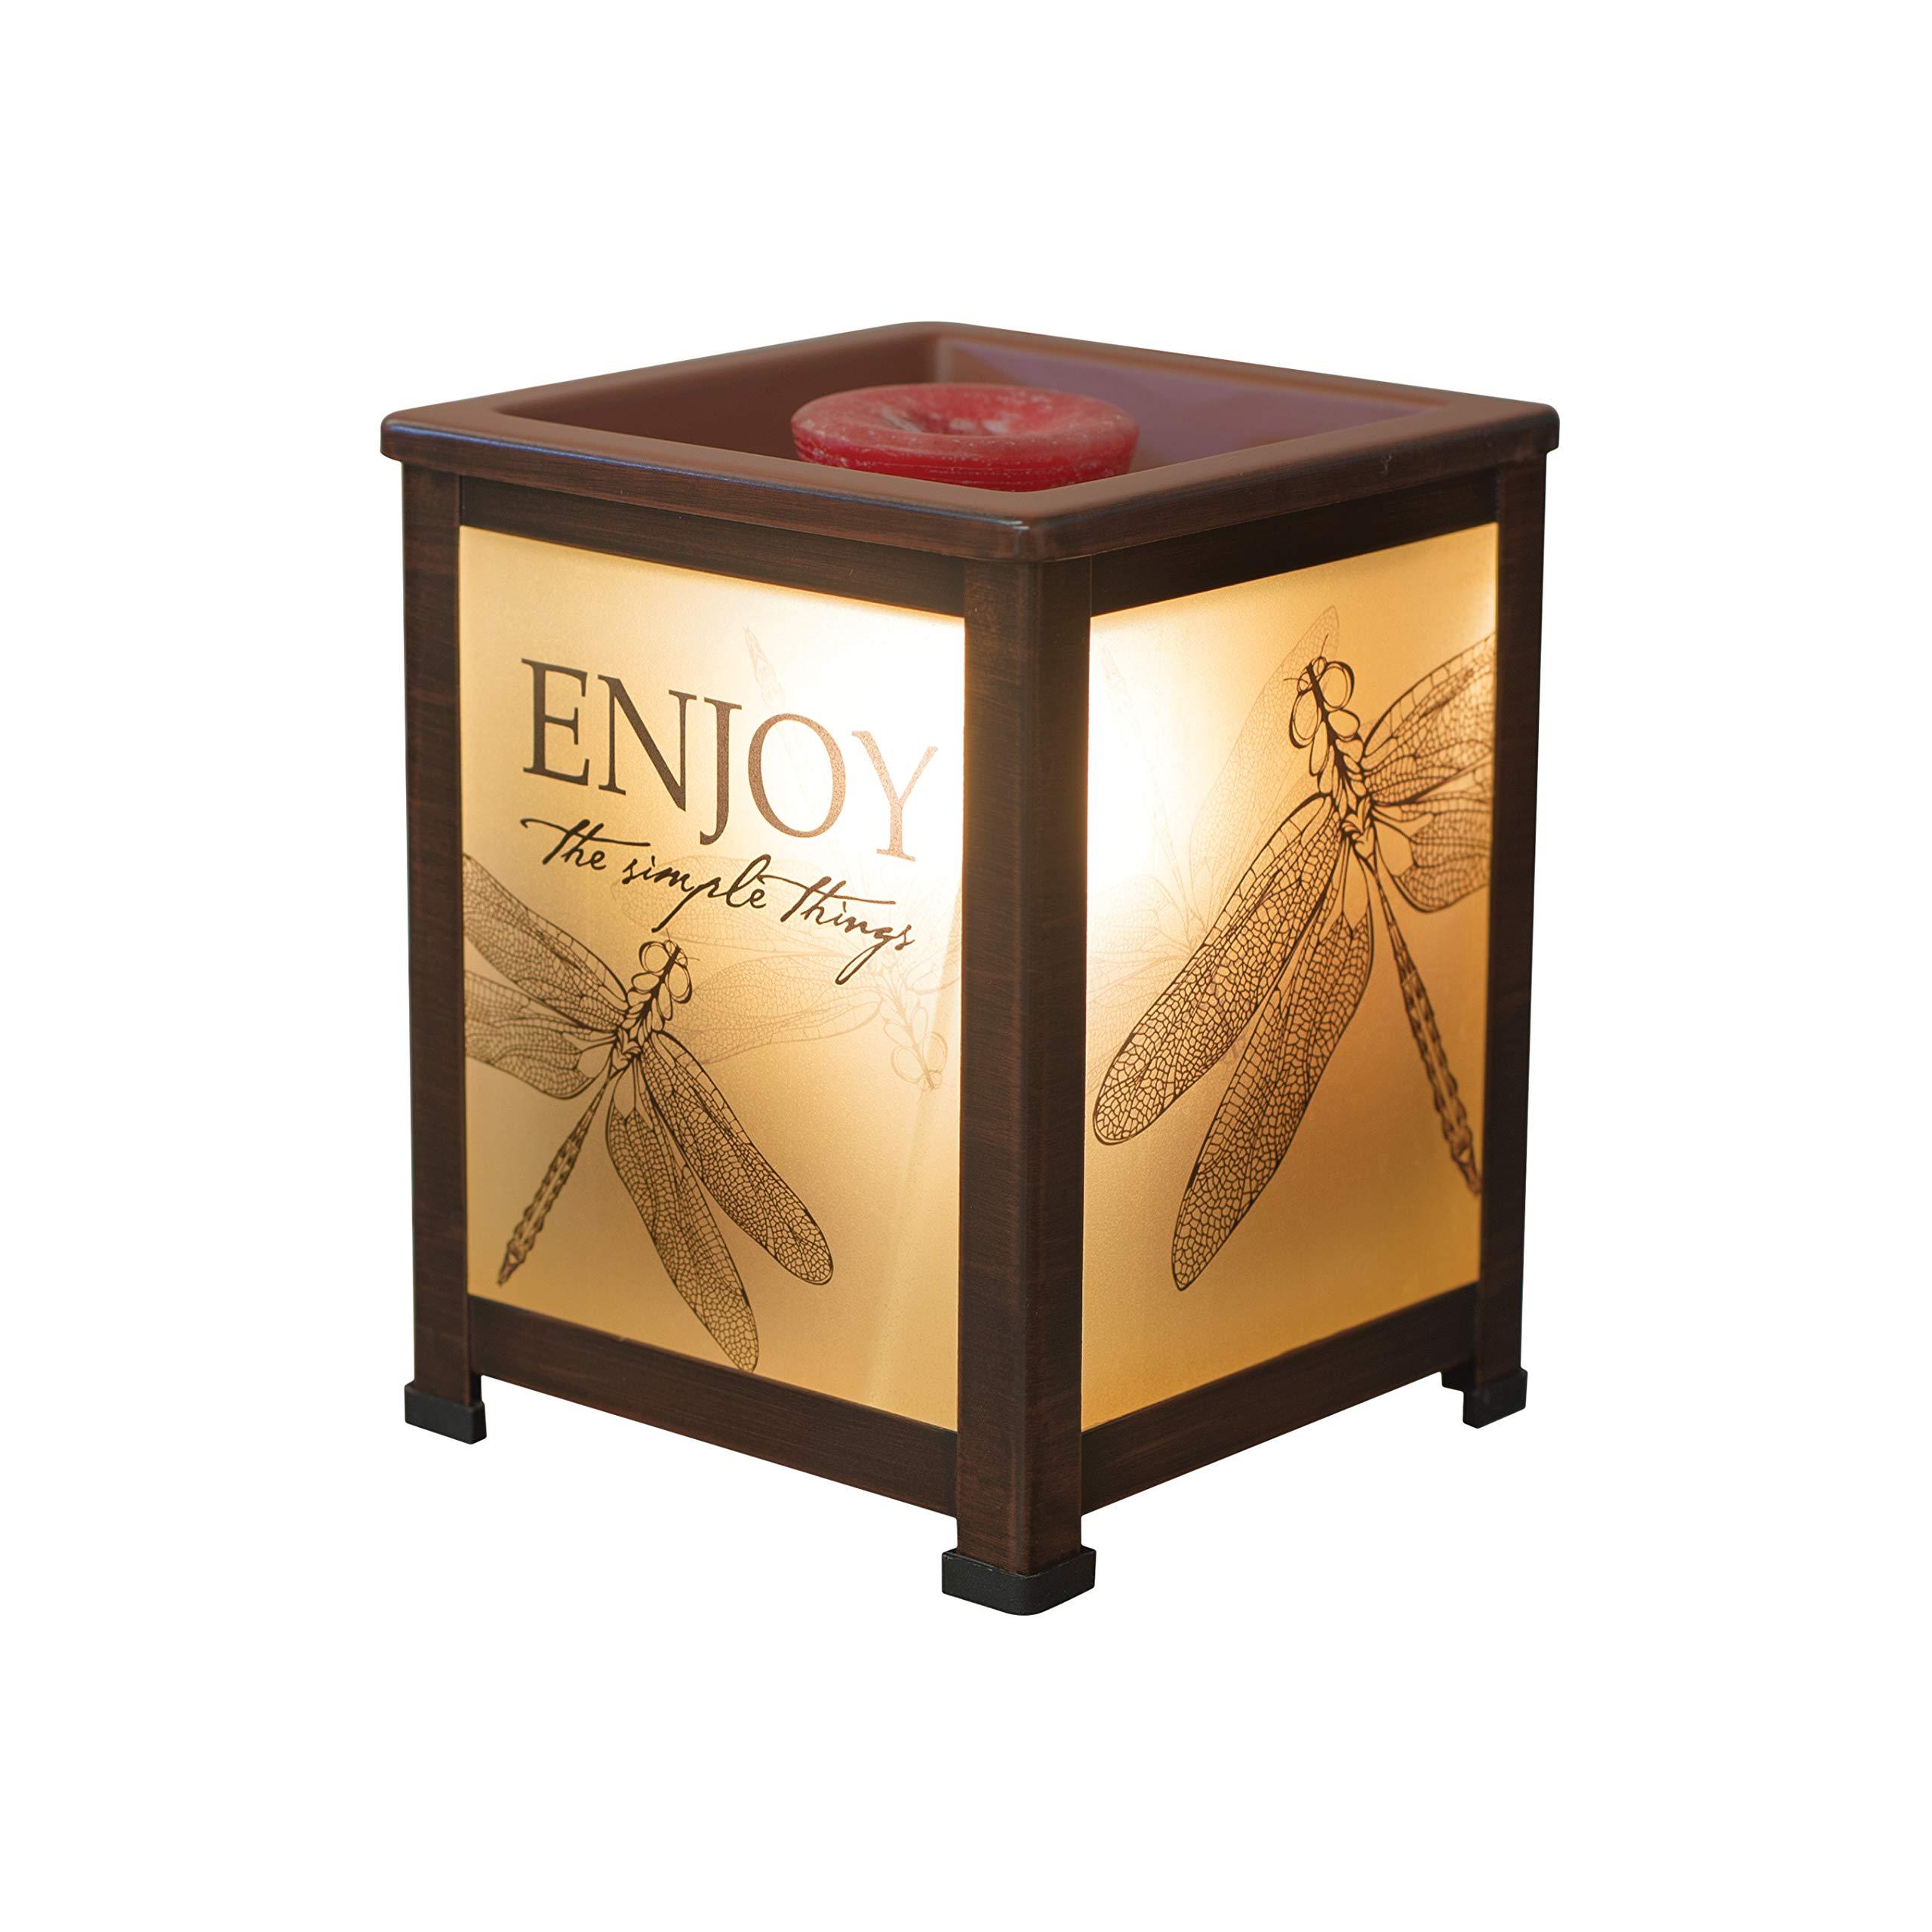 Elanze Designs Enjoy Simple Things Dragonfly Copper Tone Metal Electrical Wax Tart & Oil Glass Lantern Warmer